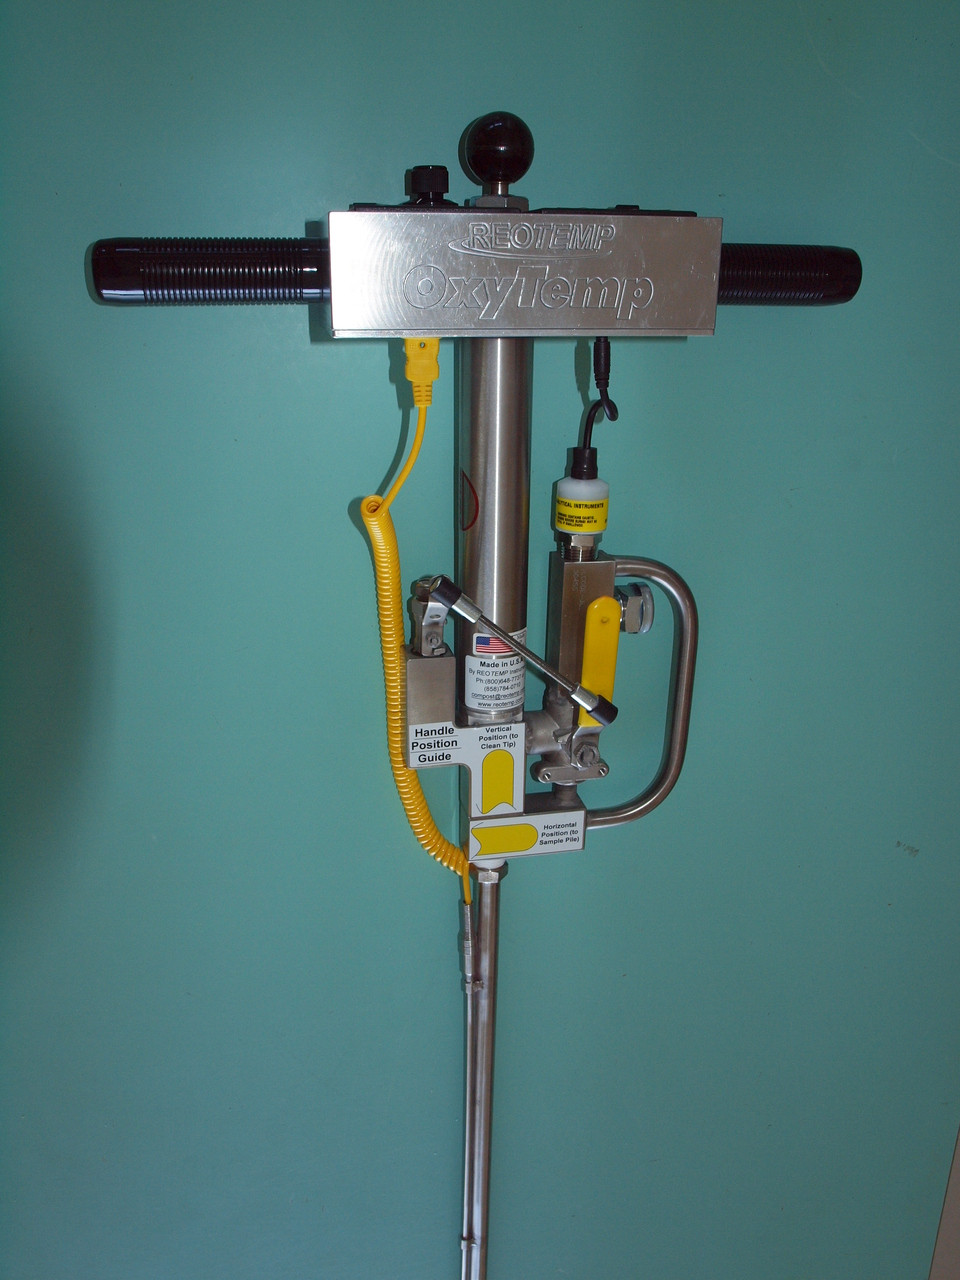 Reotemp Oxytemp probe